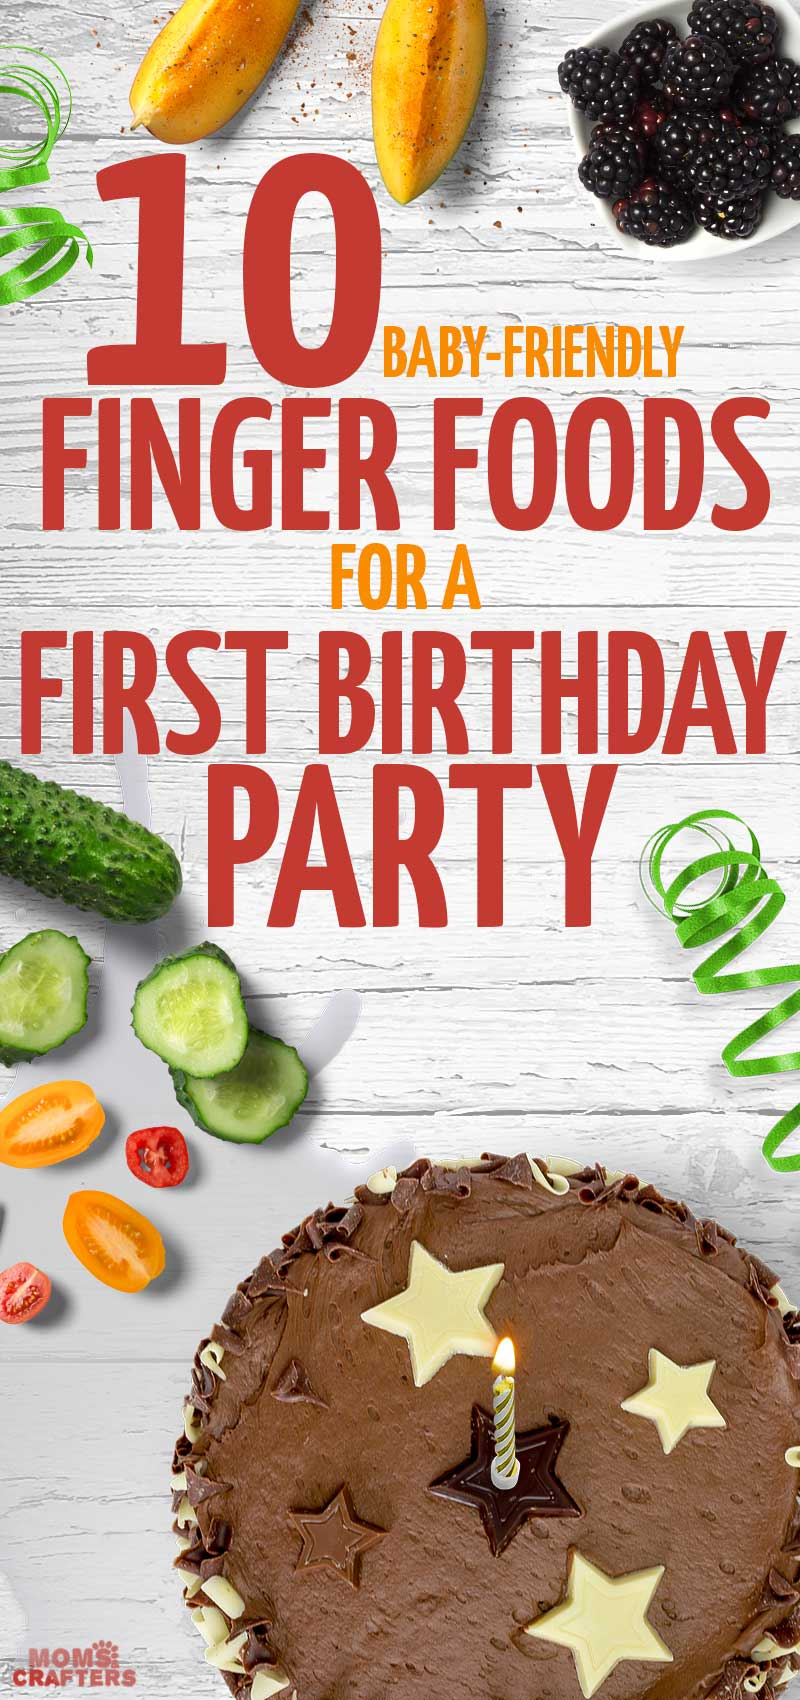 10 great finger foods